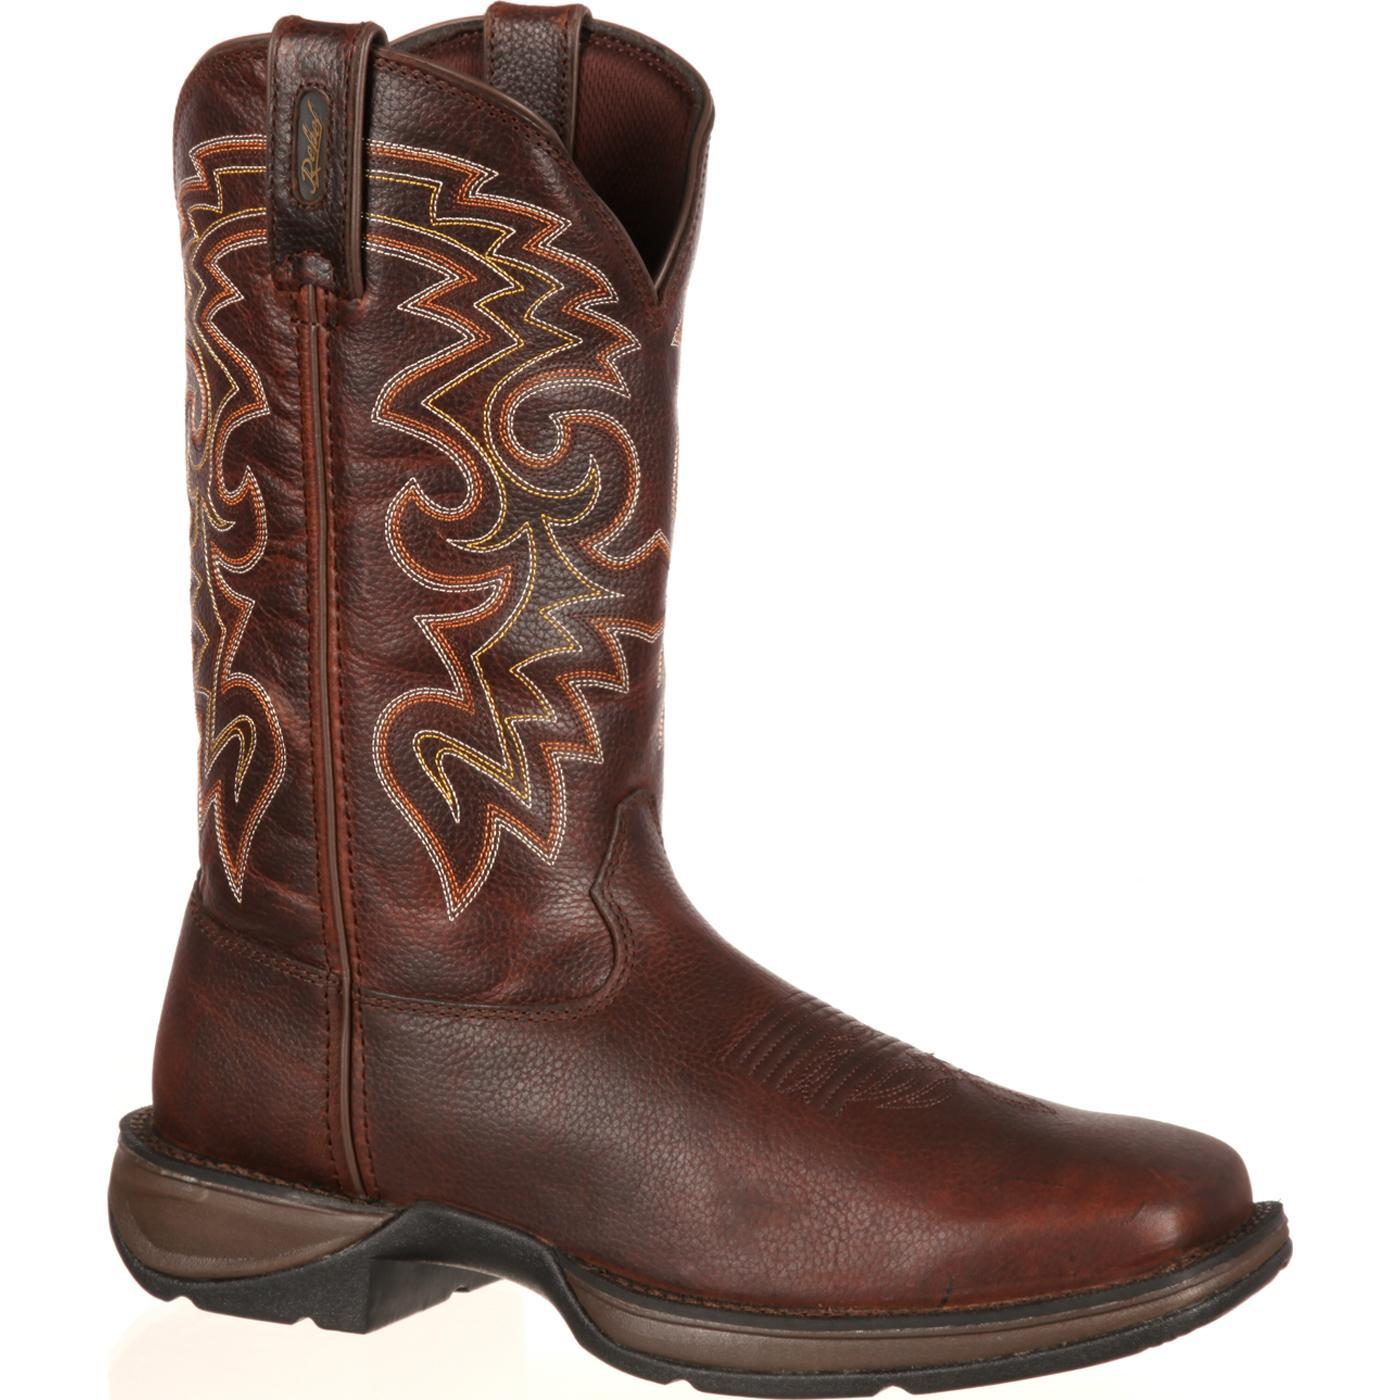 Rebel by Durango Dark Brown Pull-On Western Boot, , large